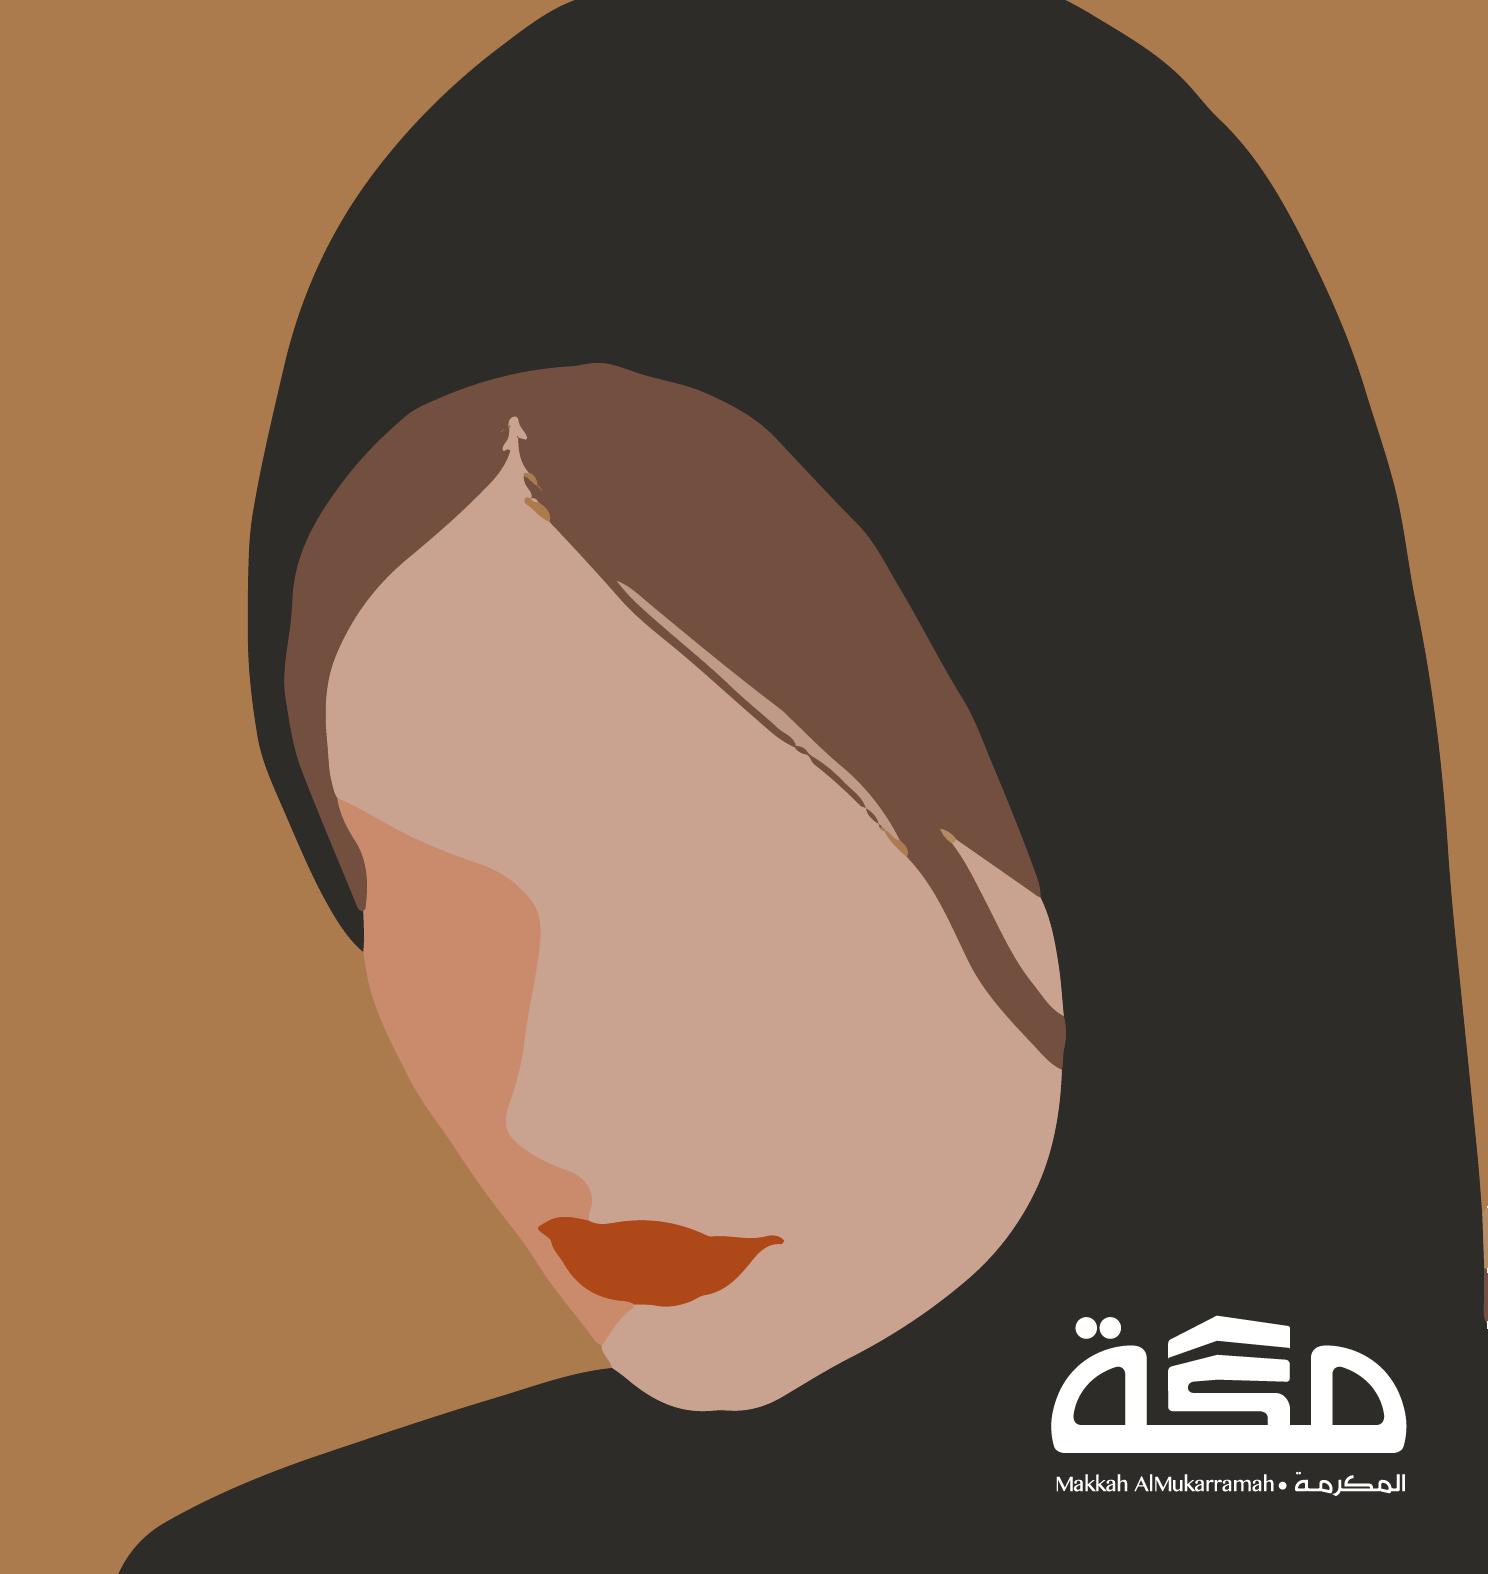 غزل اليزيدي